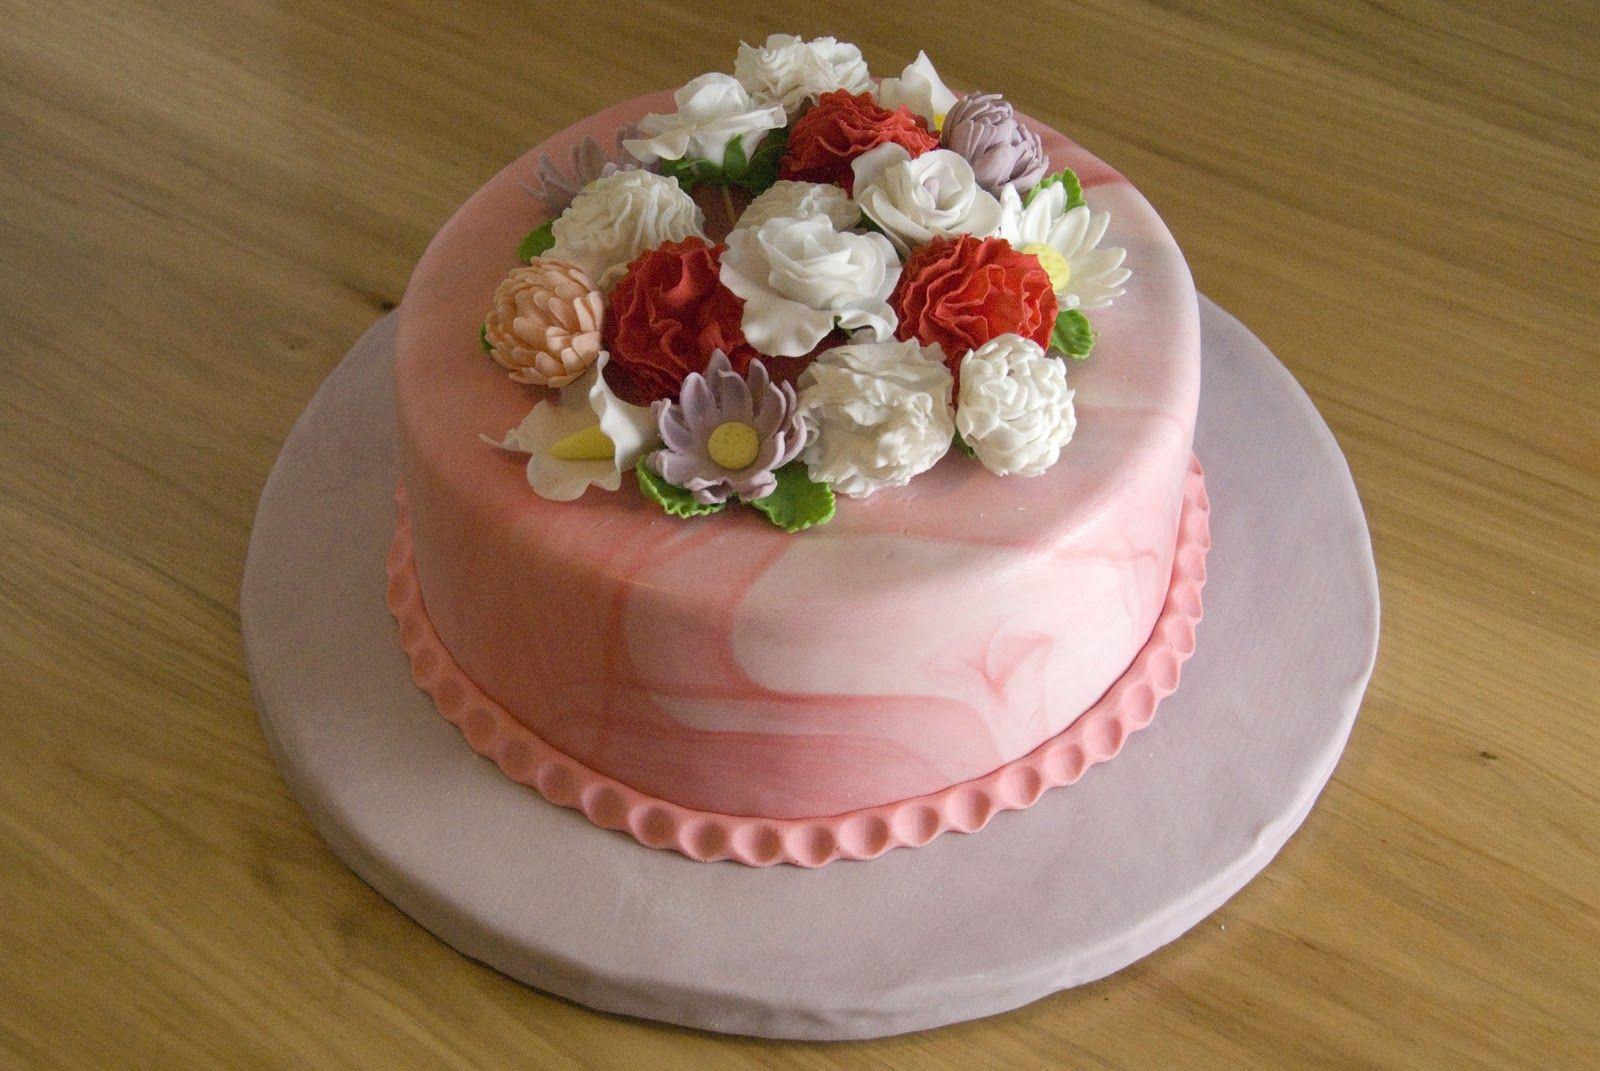 Fondant Flower Cake Night Baking 3rd Blogiversary Fondant Flower